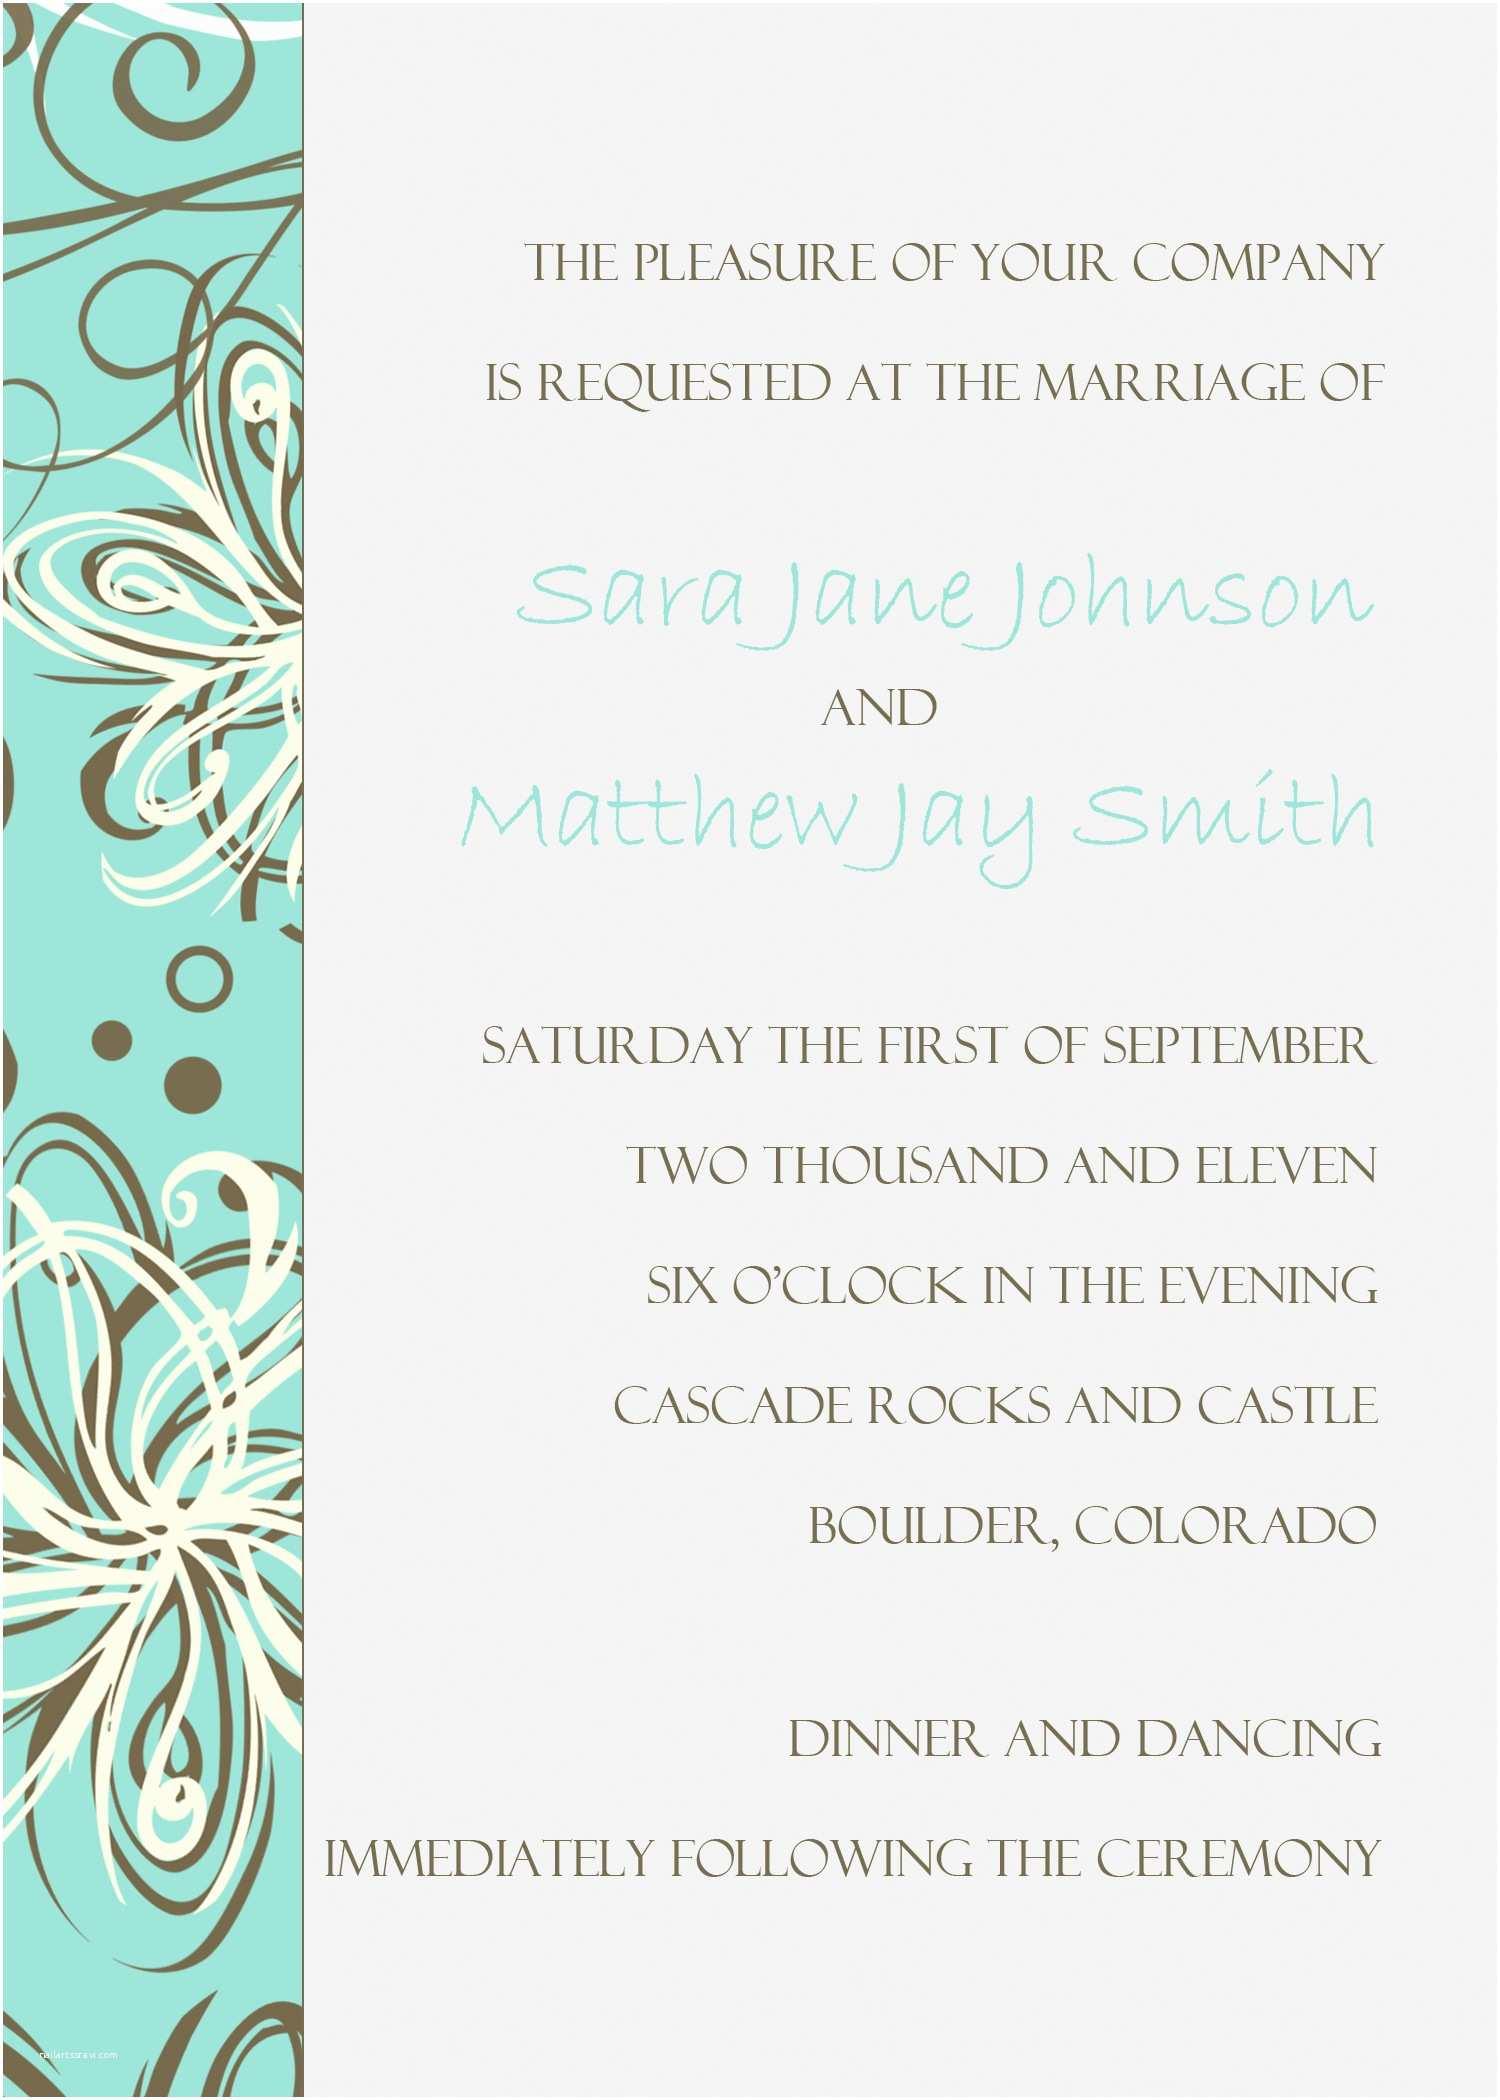 Free Wedding Invitation Samples Free Wedding Invitation Templates